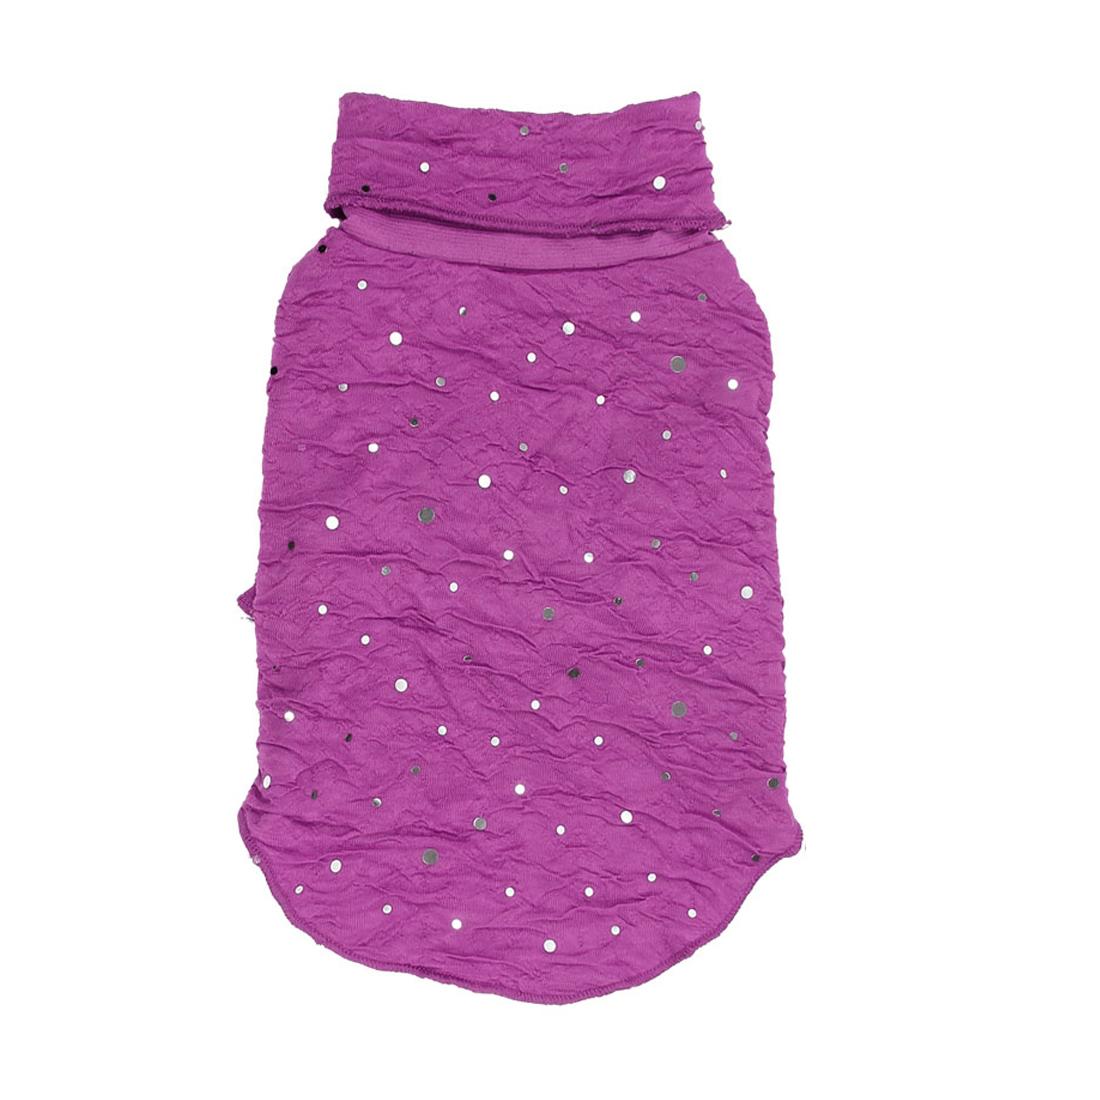 Pet Dog Puppy Turtleneck Sequins Clothes Clothing Apparel Costume Purple Size S